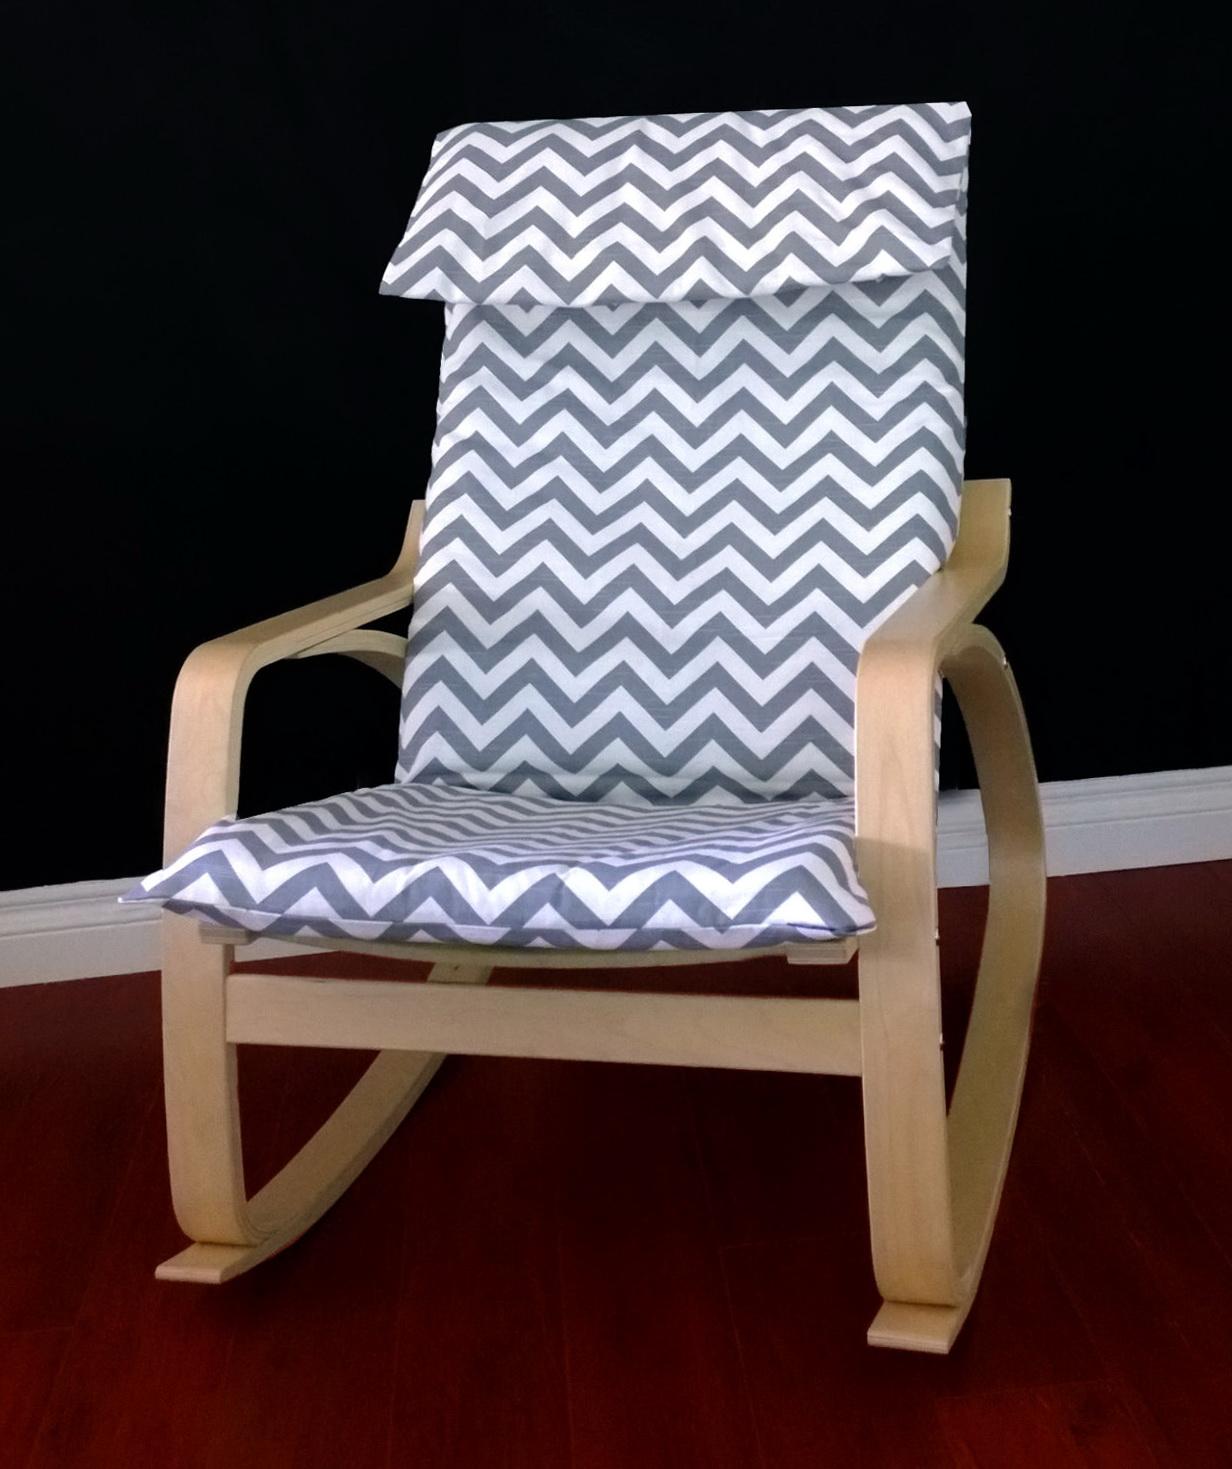 Ikea Poang Chair Cushion Cover